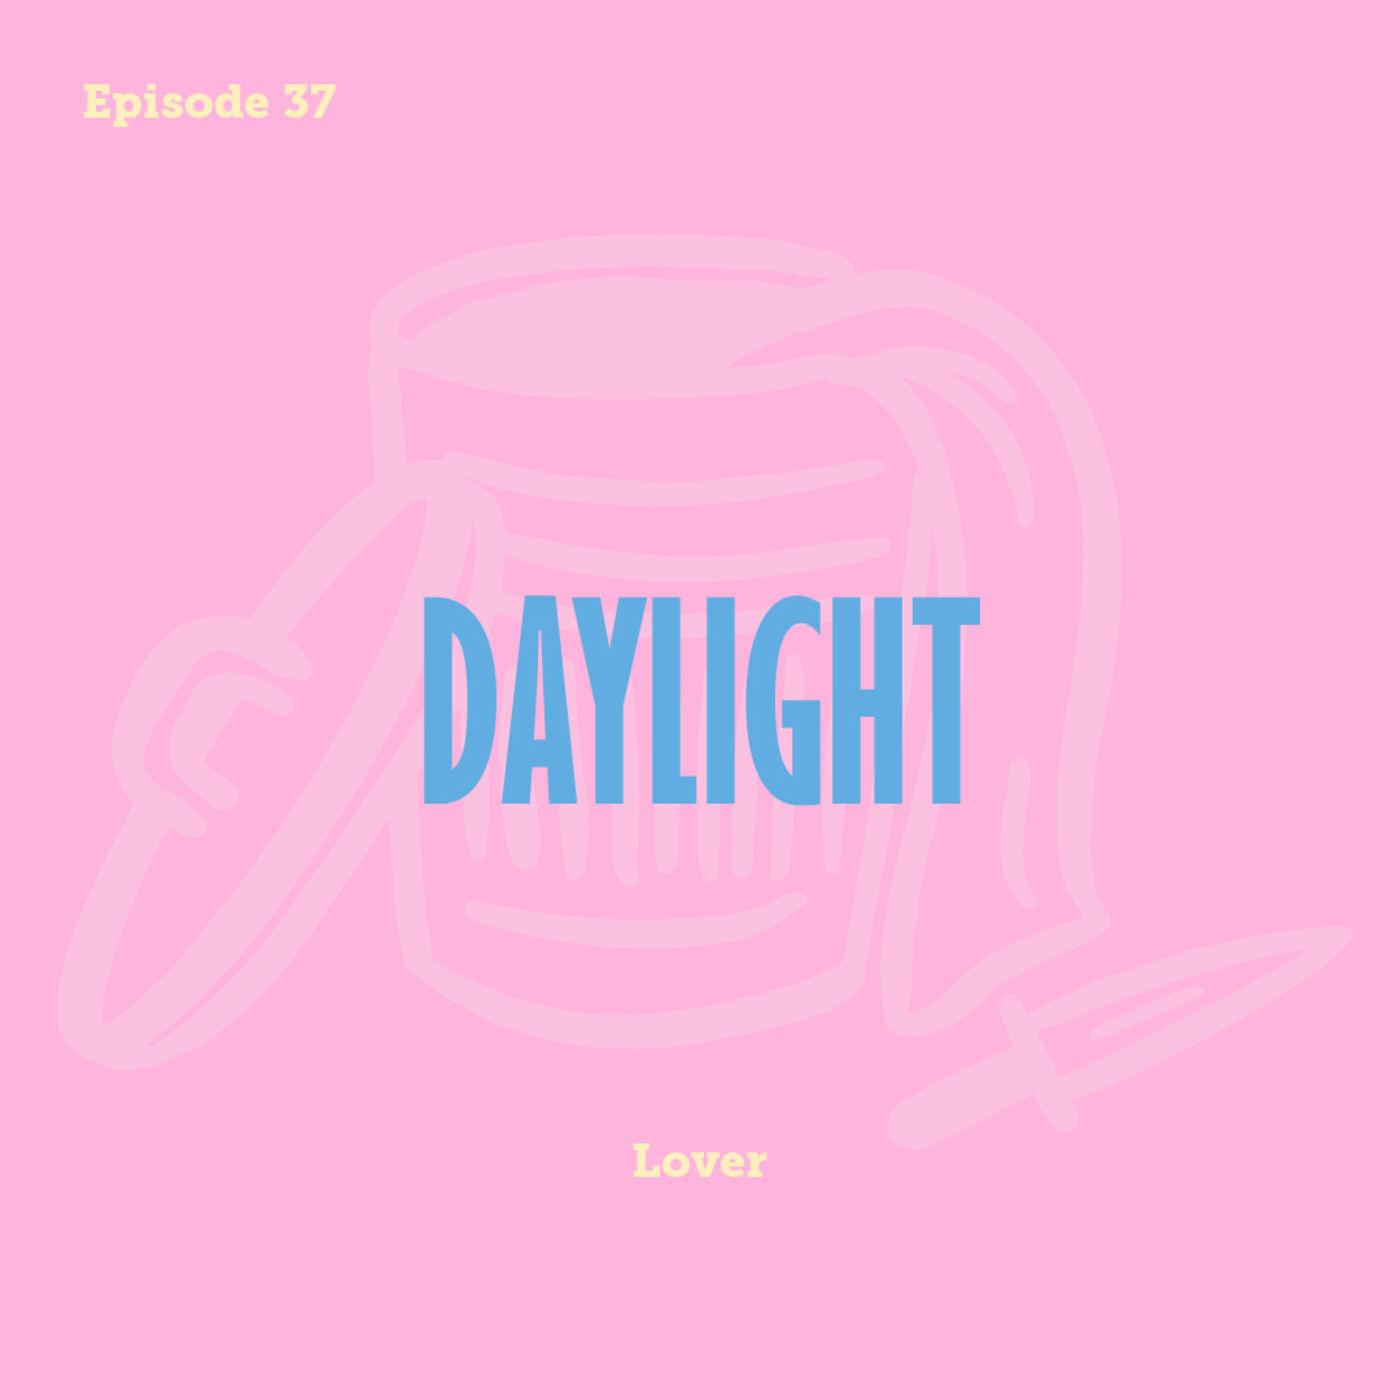 Tay to Z Episode 37: Daylight